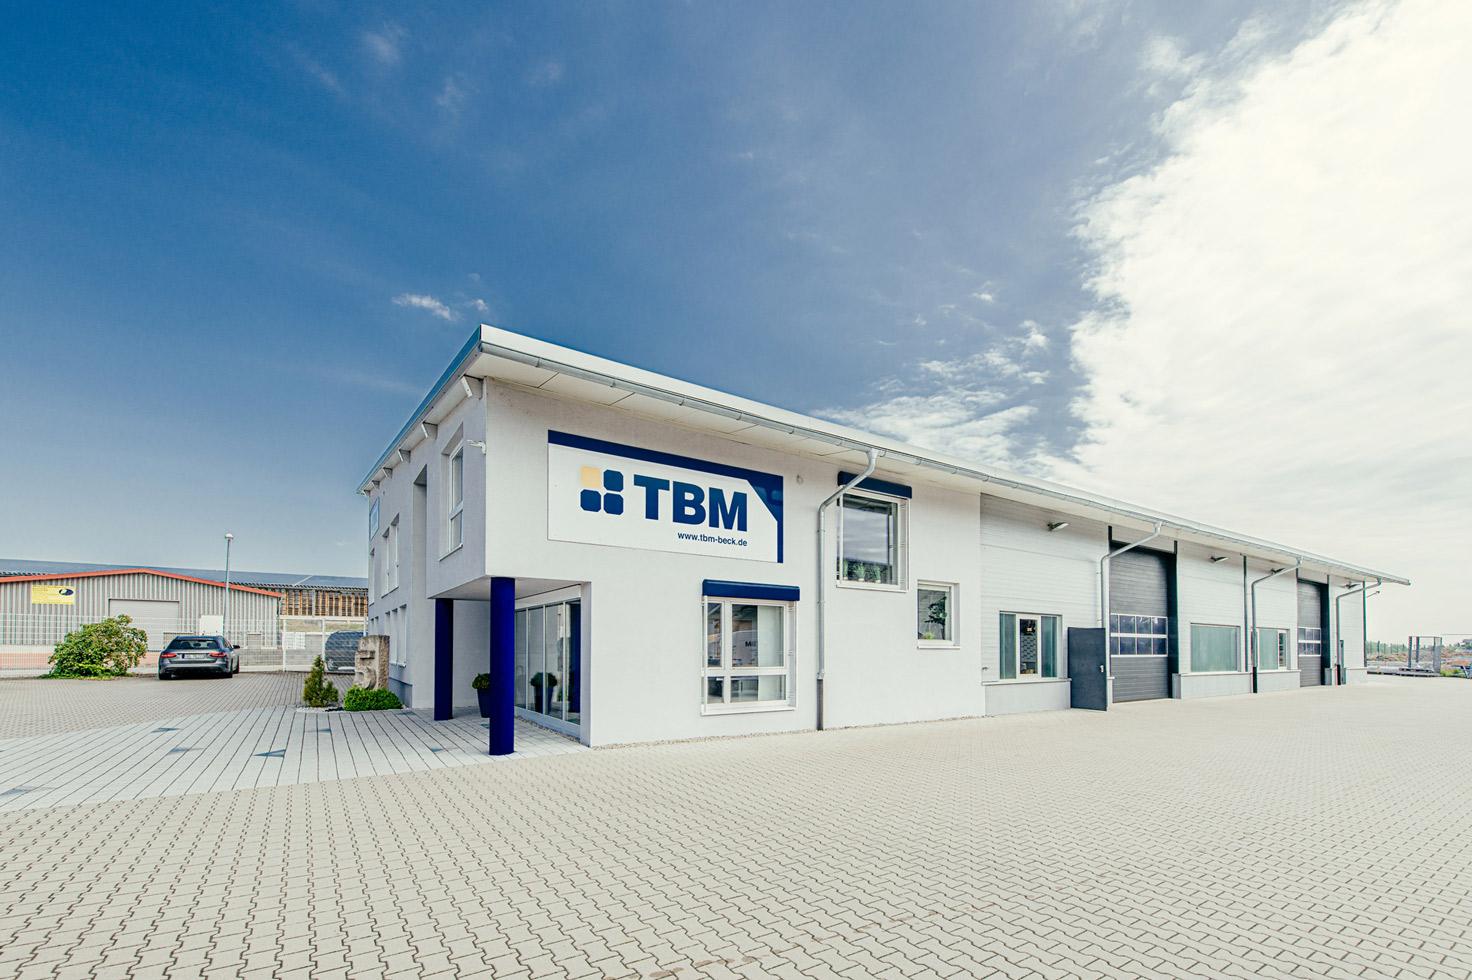 Firmengebäude TBM in Kressberg